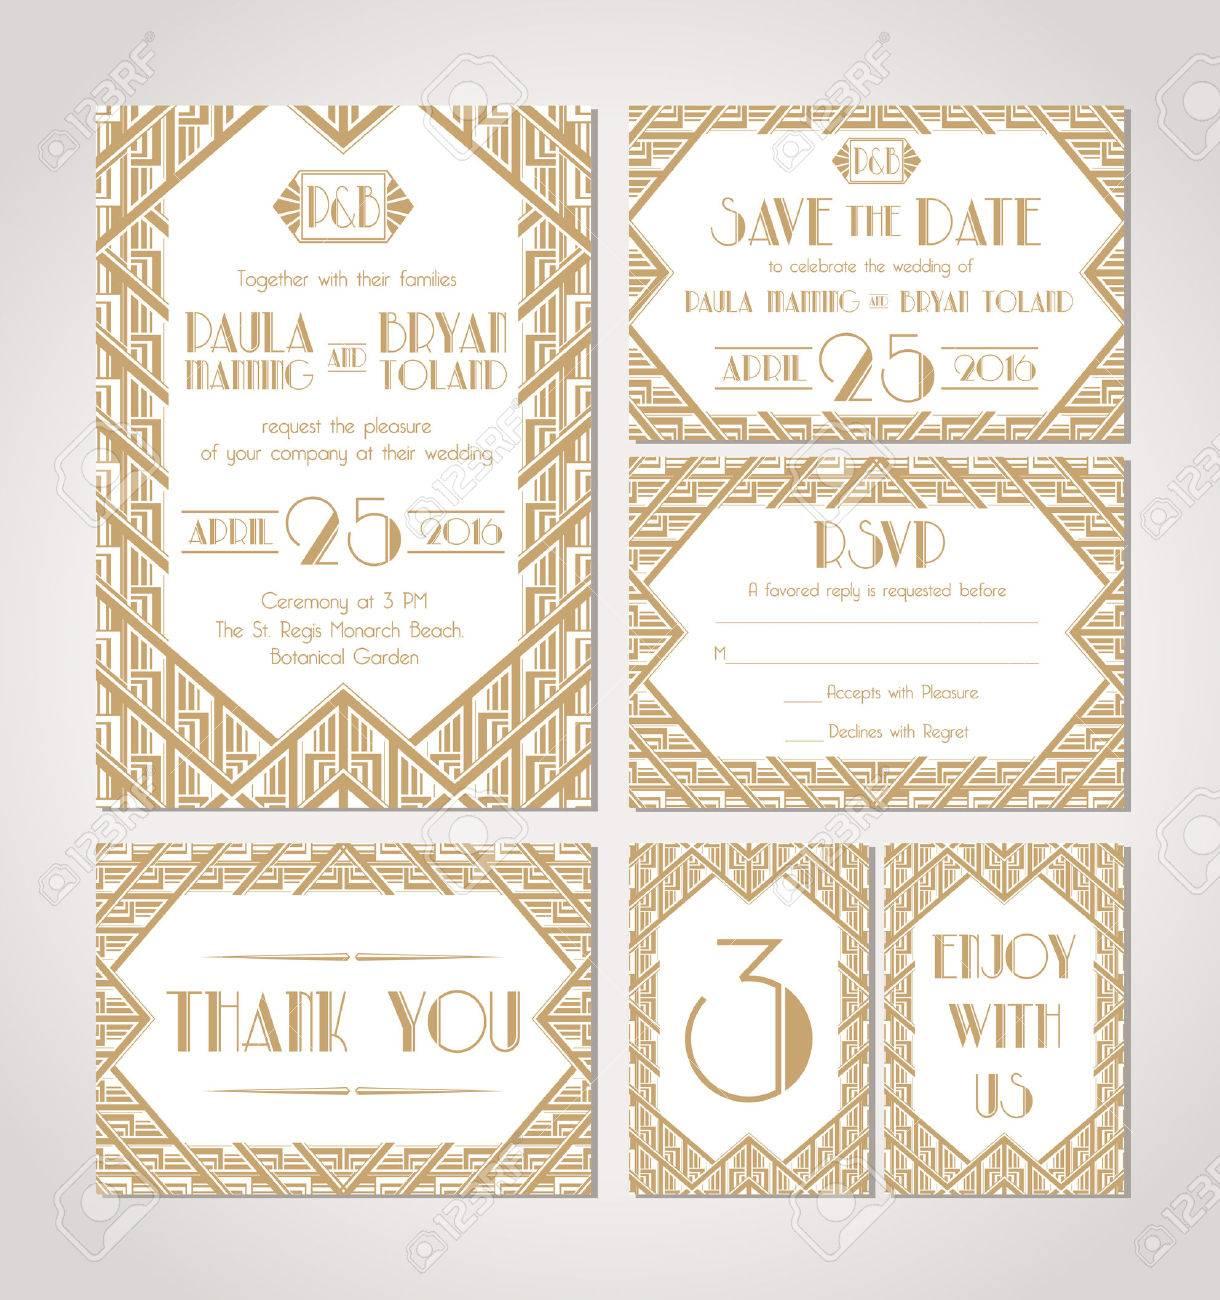 great gatsby gatsby wedding invitations With